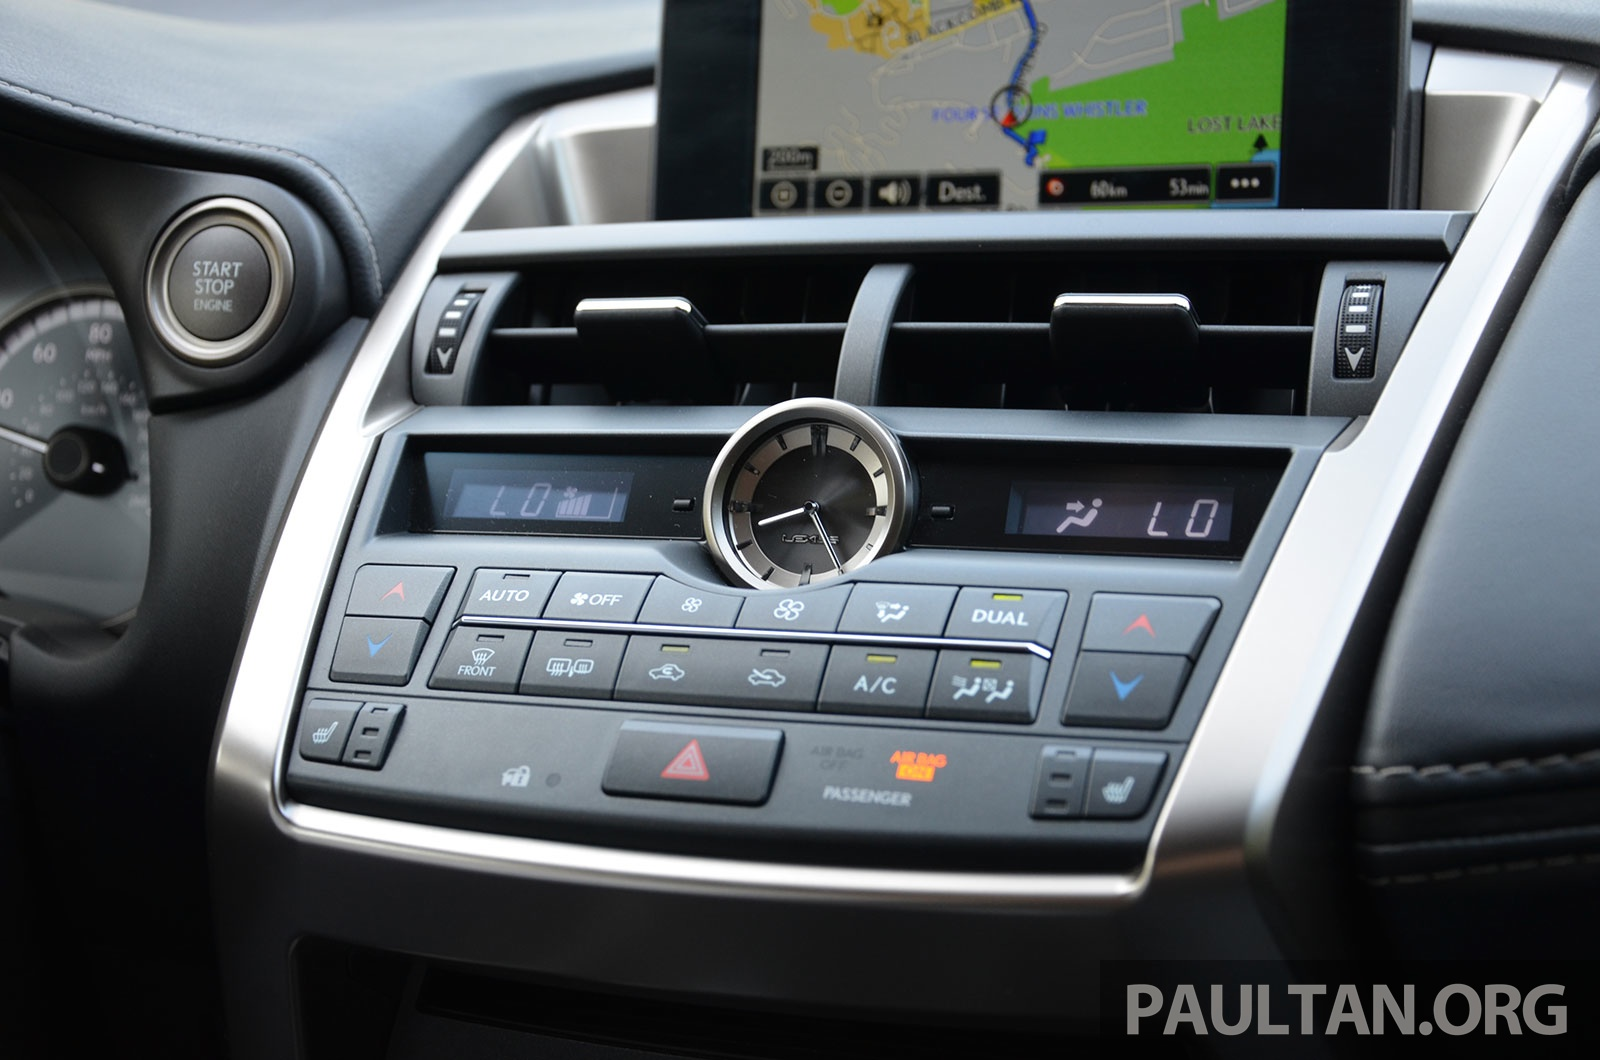 Suv Lexus 2018 >> DRIVEN: Lexus NX 200t SUV tested in British Columbia Paul Tan - Image 285869